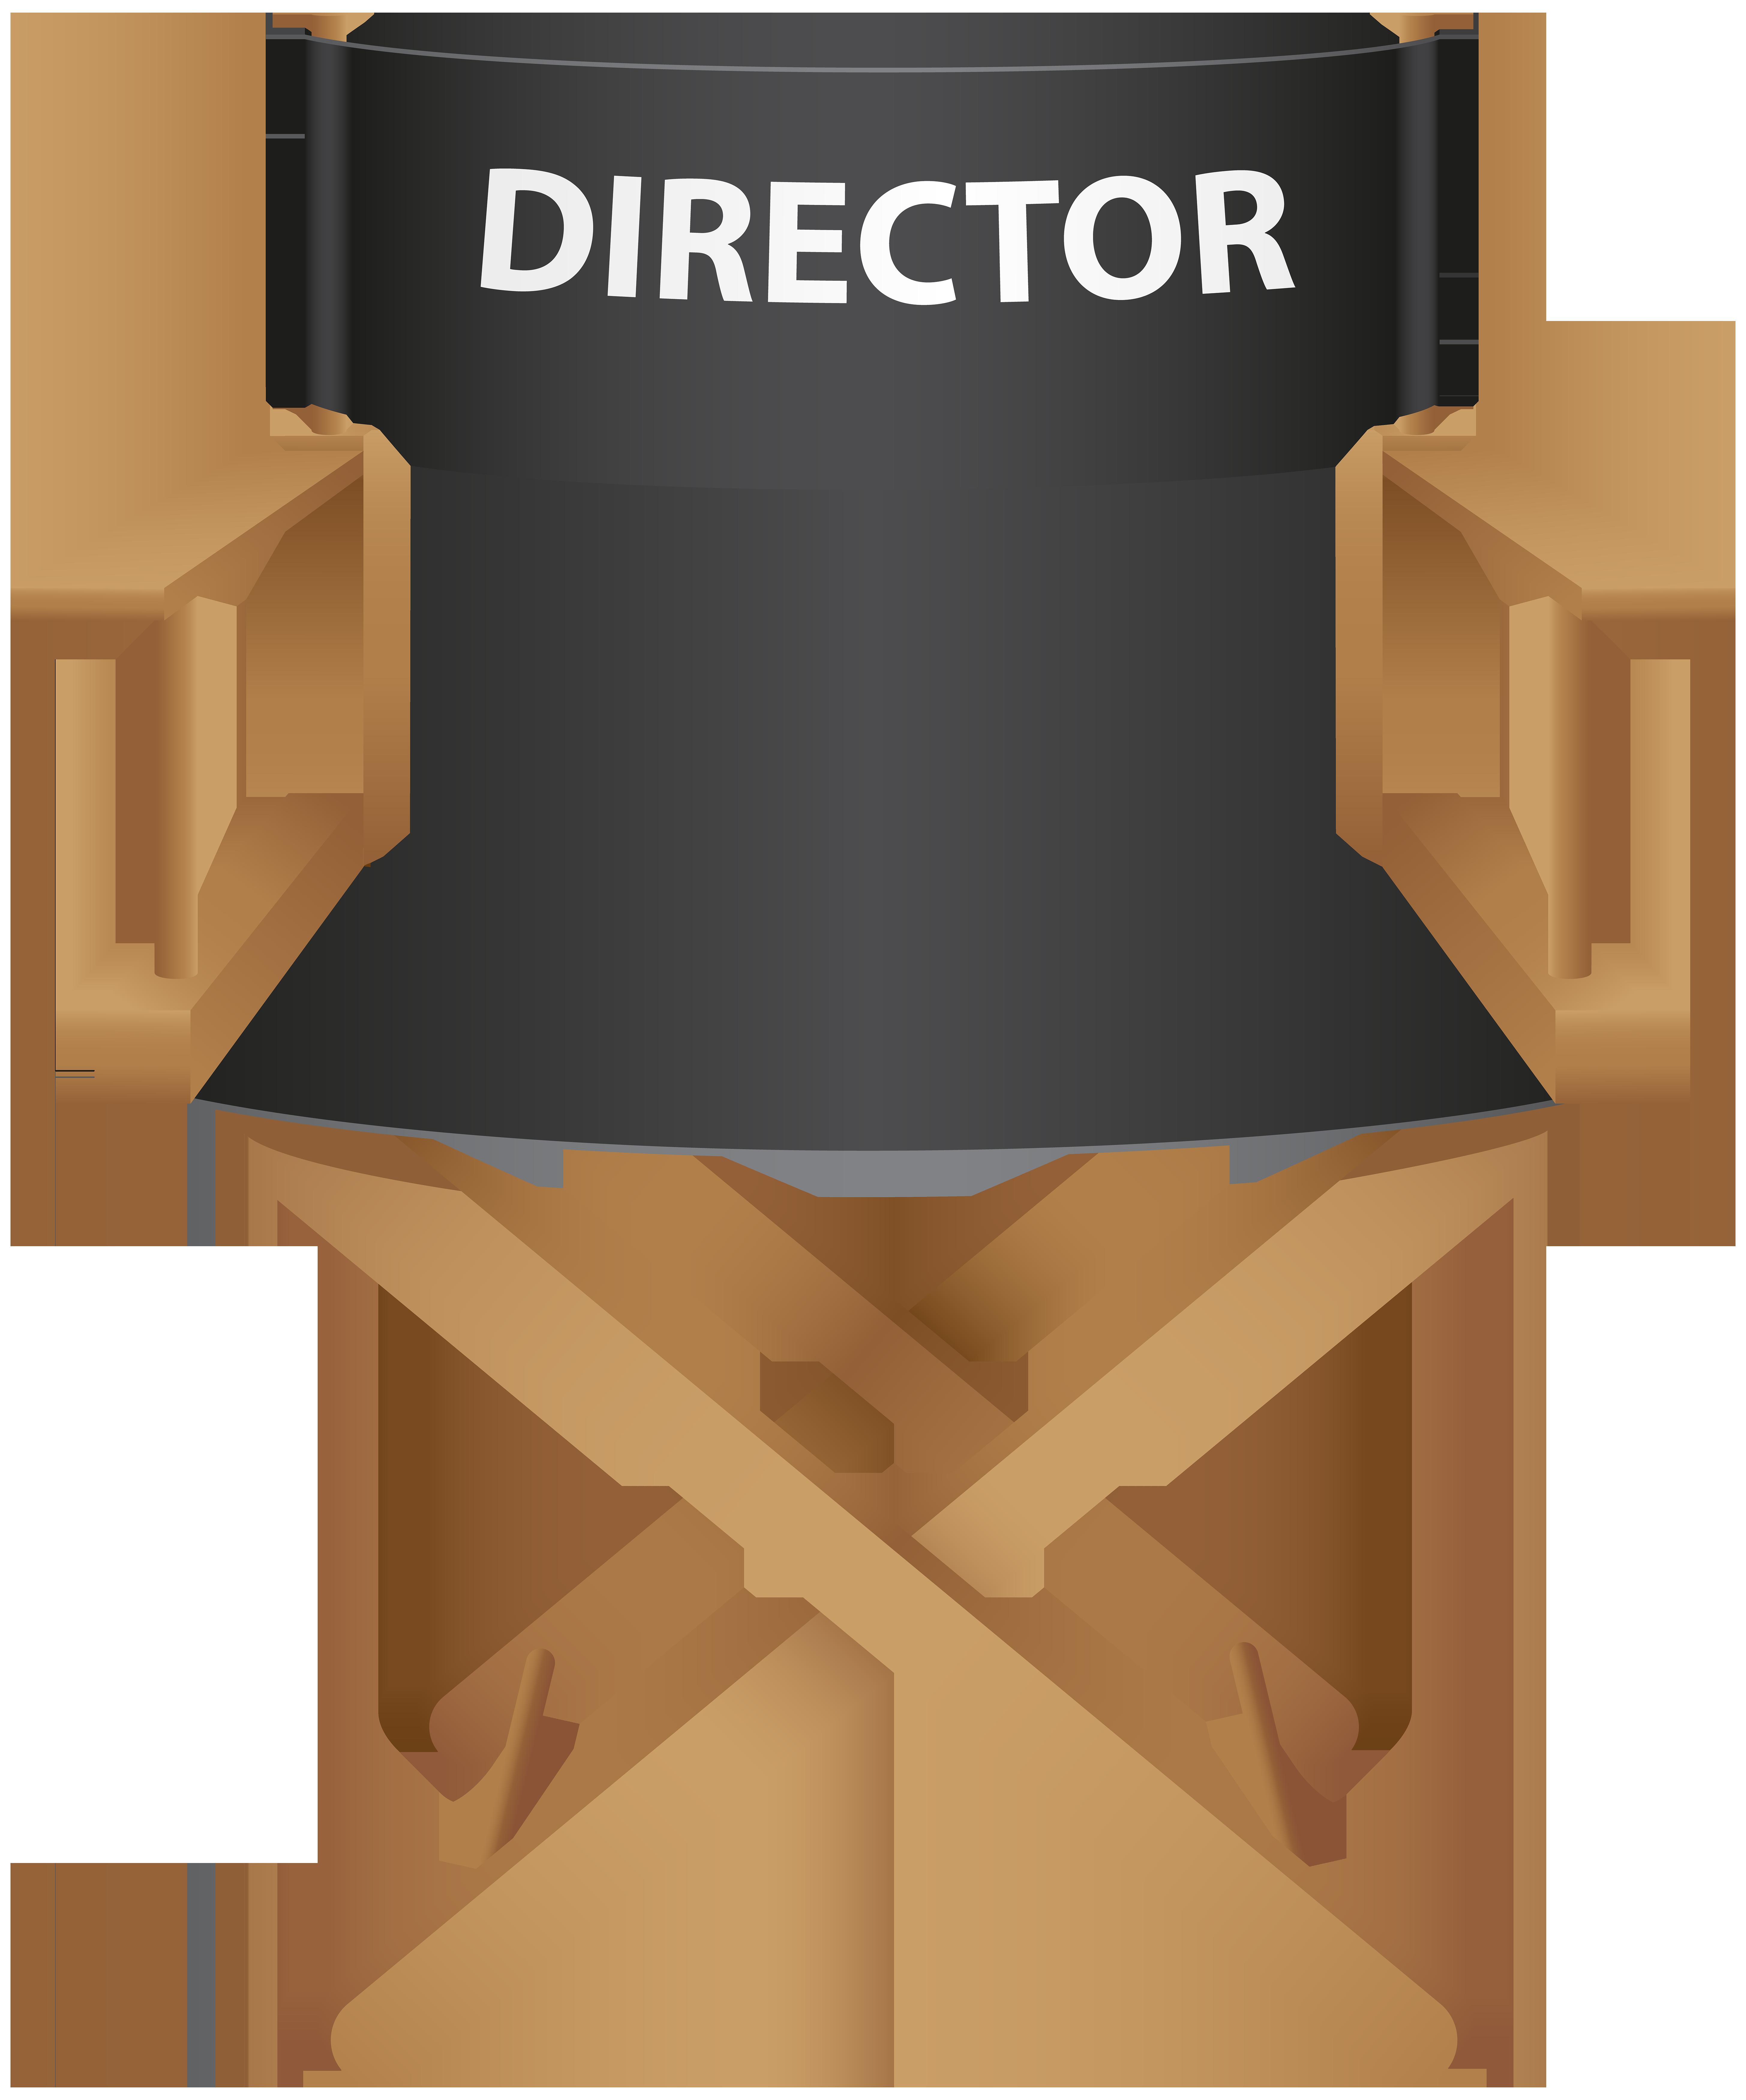 Clipart chair wooden chair. Directors png clip art